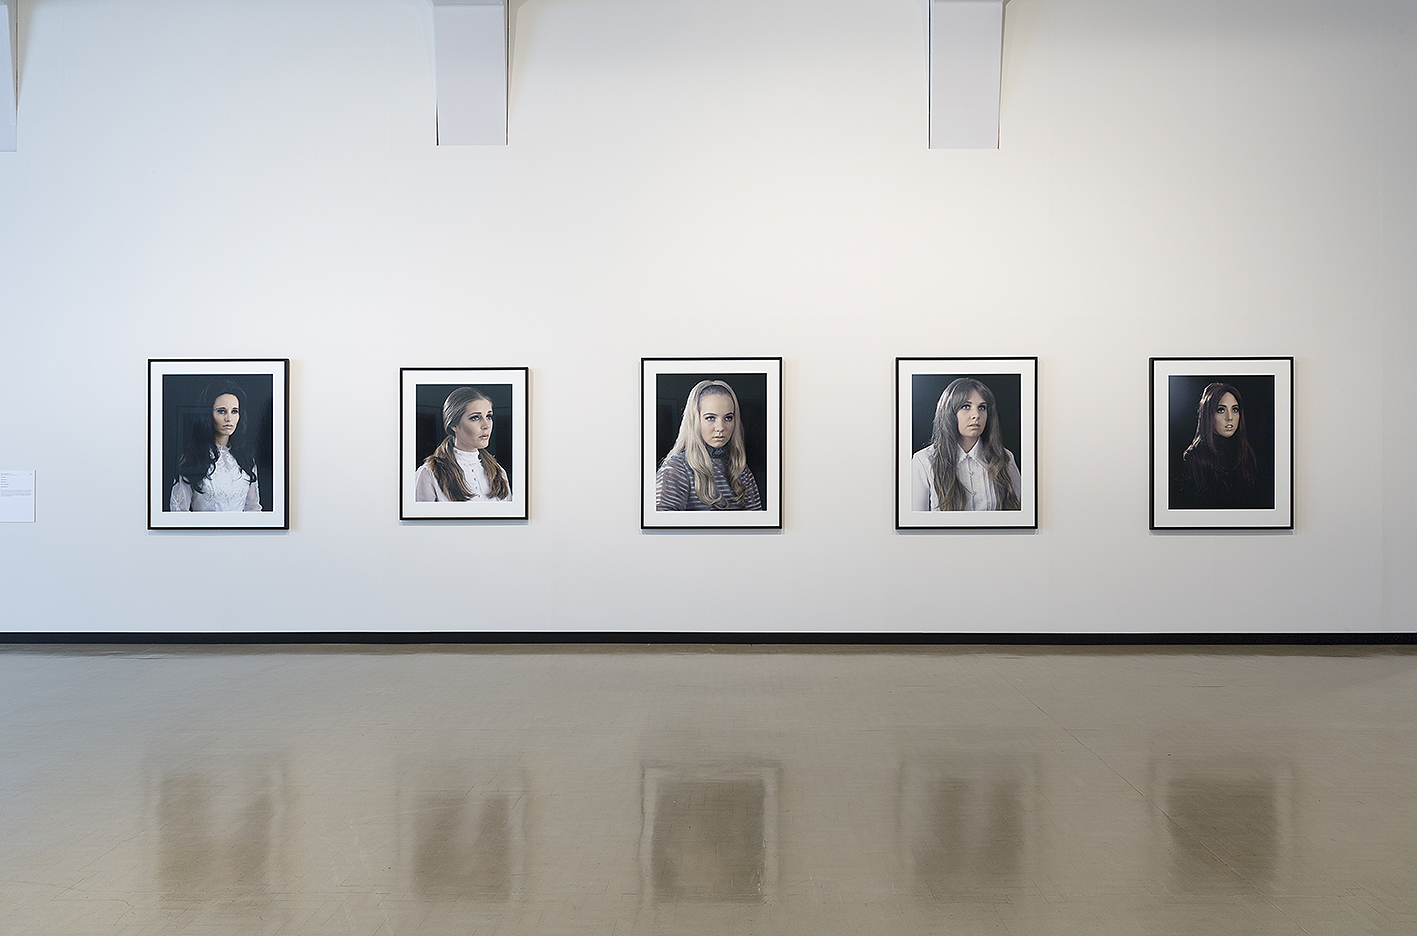 City Gallery_Yvonne Todd_Creamy Psychology_documentation_hiRez_030.jpg